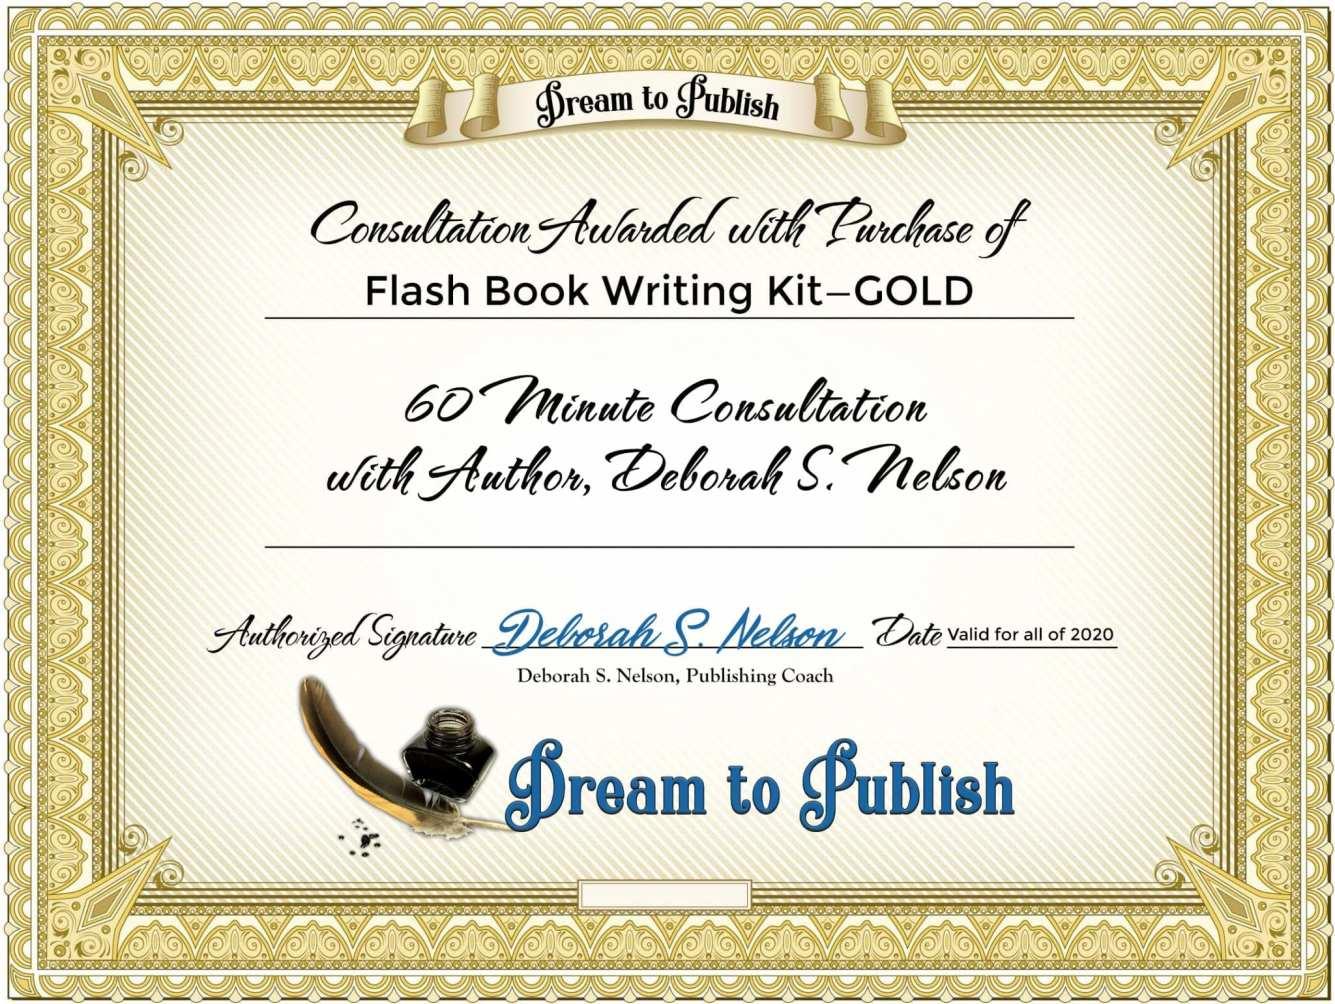 Flash Book Writing Kit—GOLD Certificate